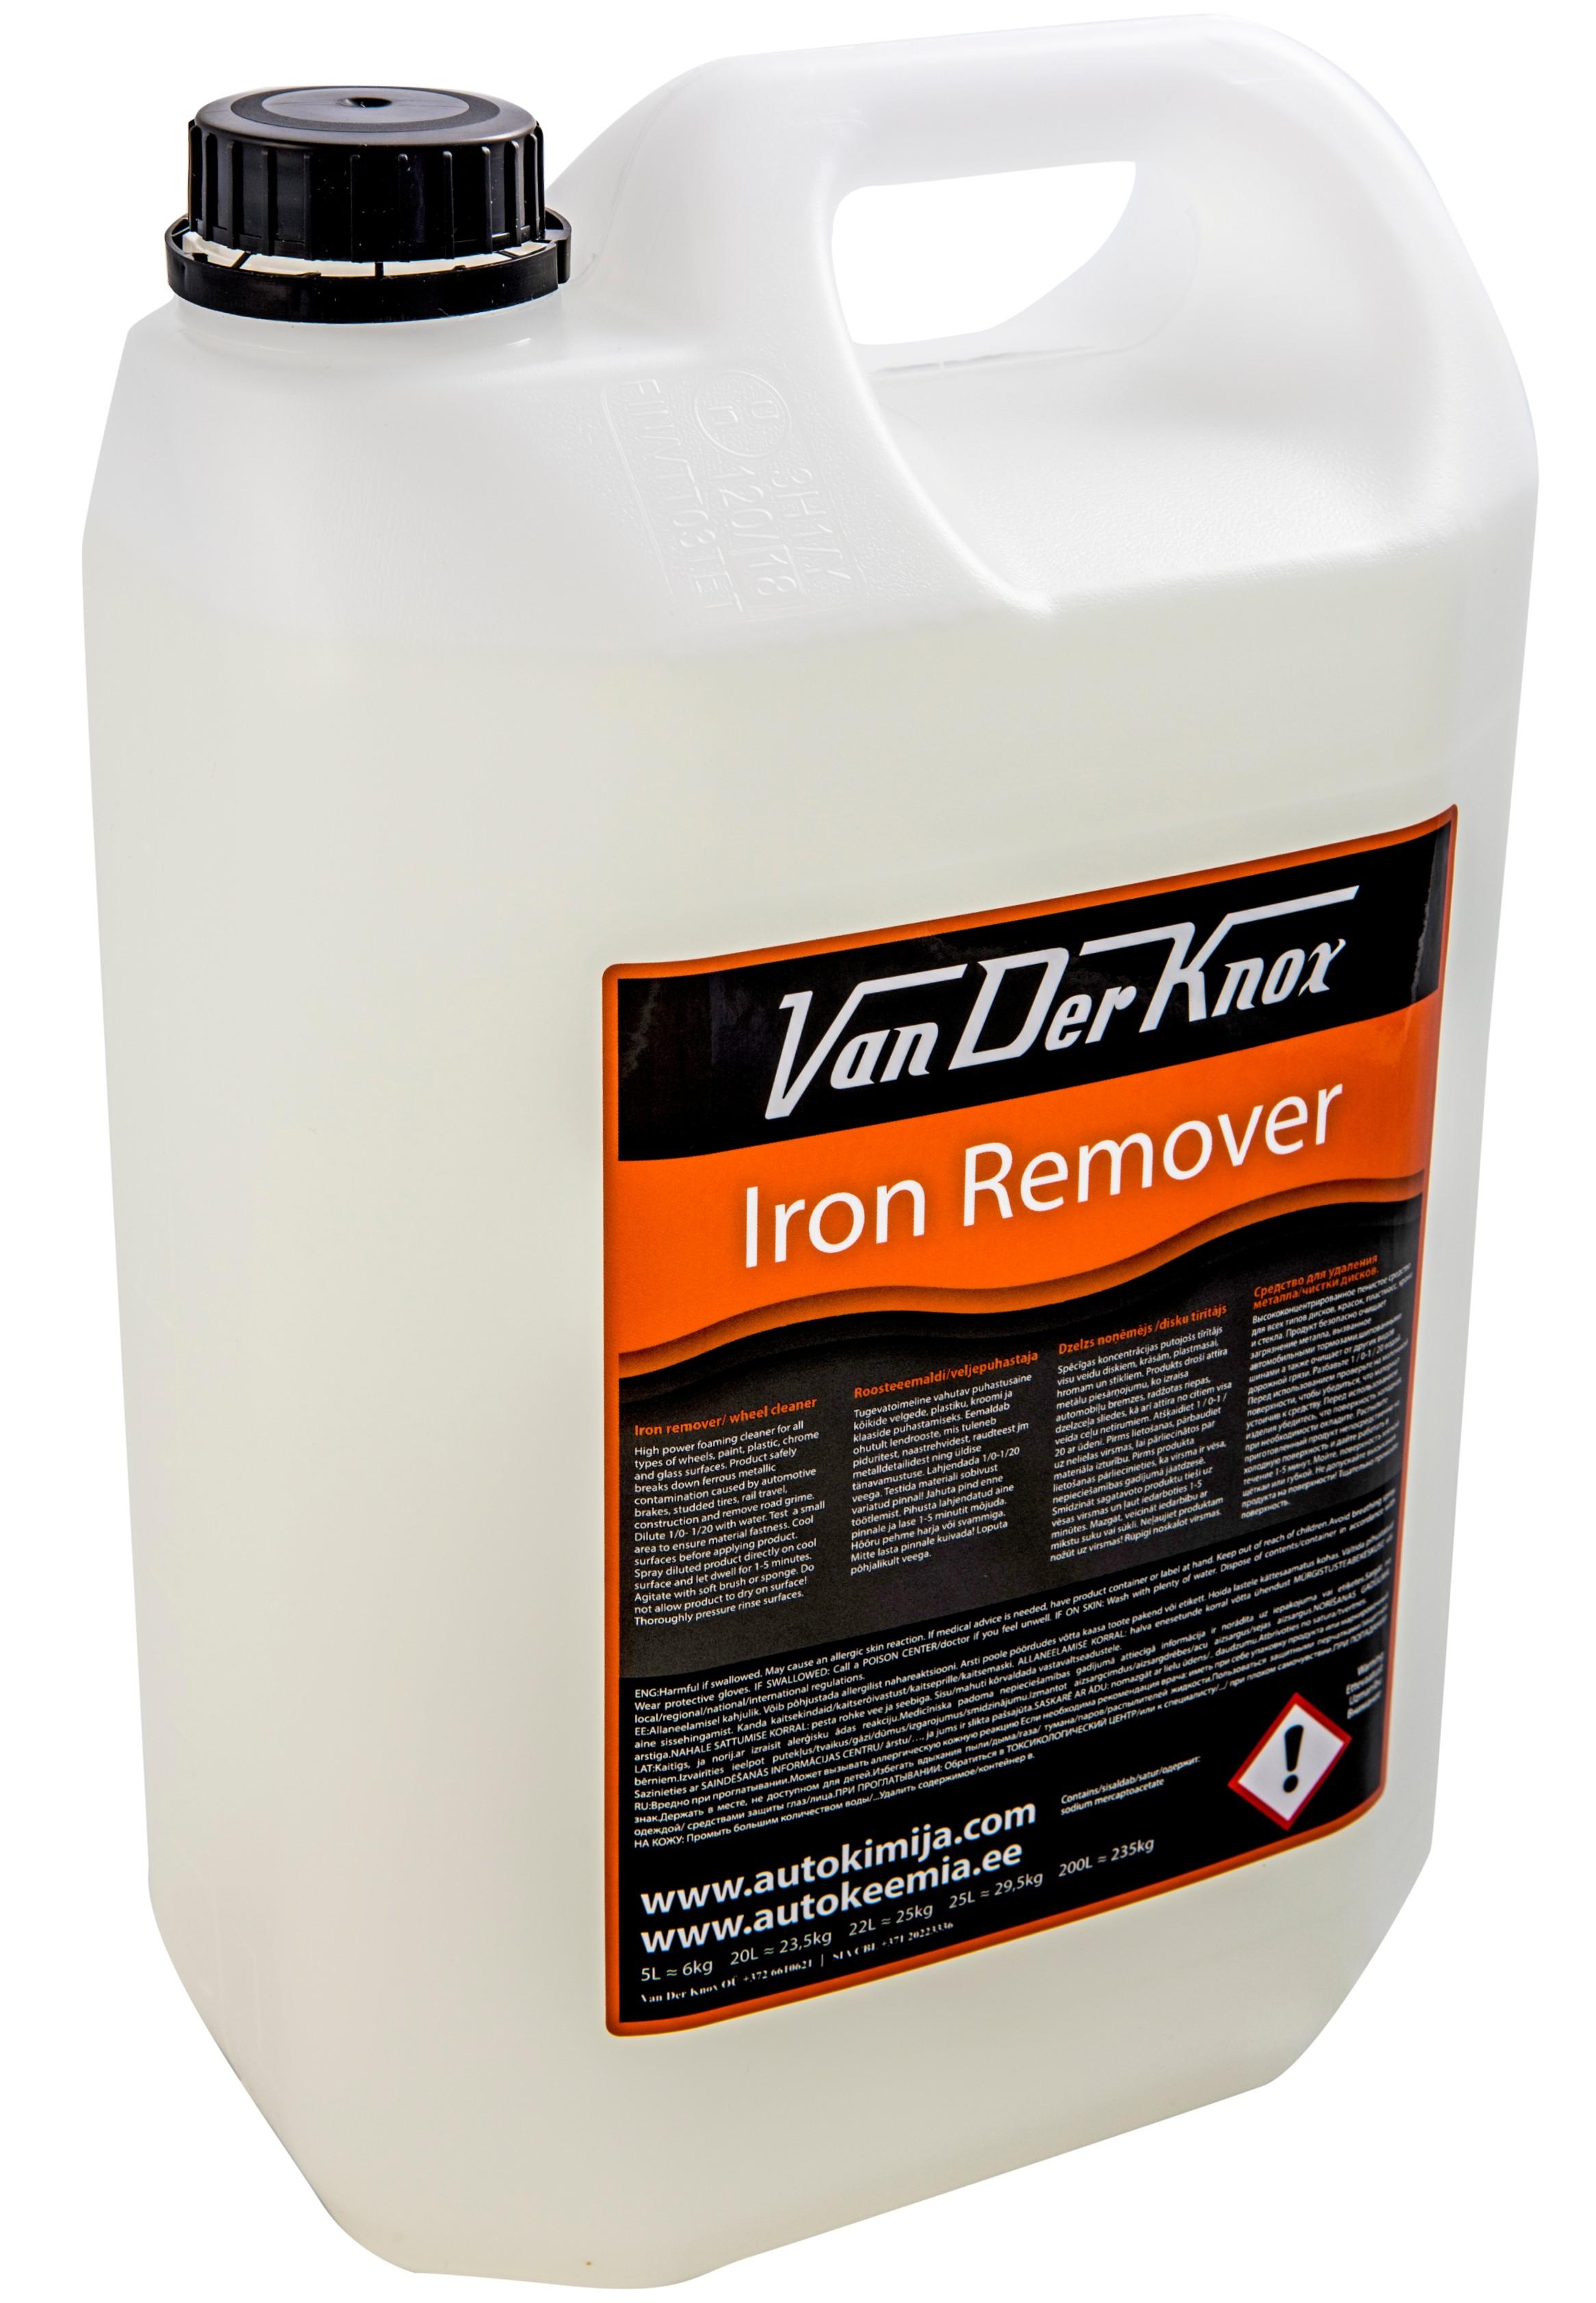 IRON REMOVER - Van Der Knox - roosteladestuste eemaldi - lendrooste eemaldi - neutraalne veljepuhastaja